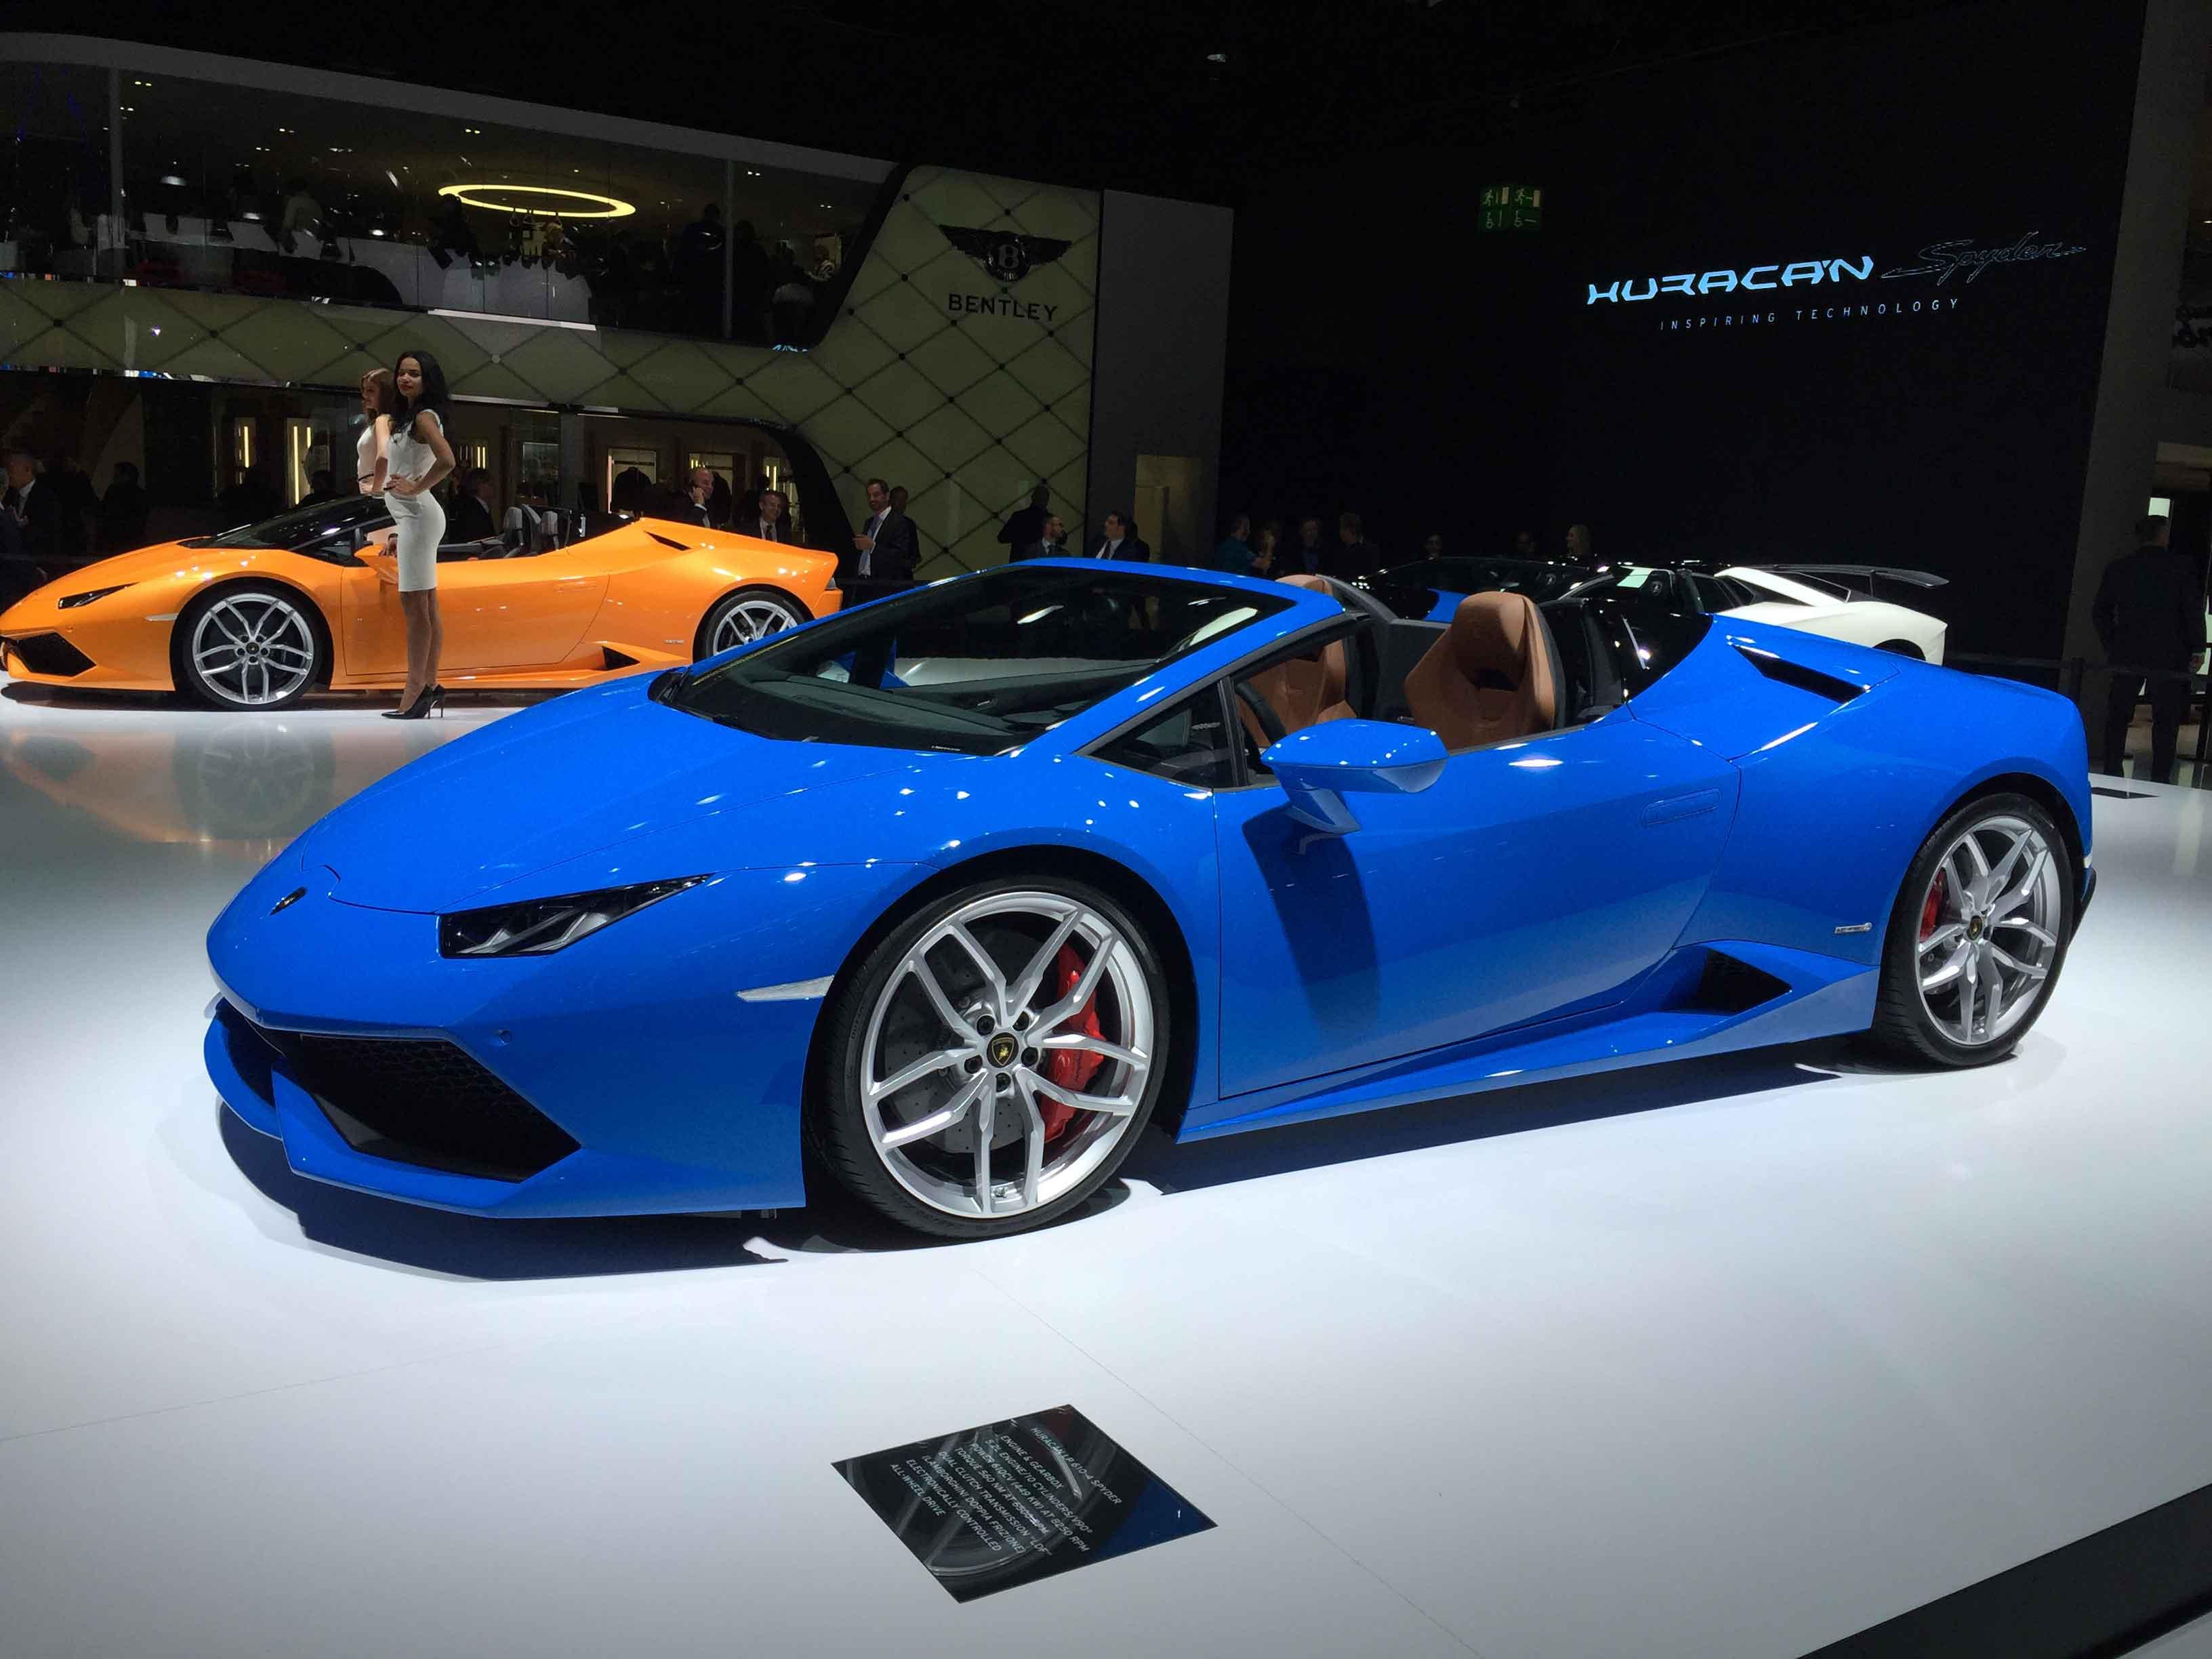 Lamborghini Huracan Lp 610 4 Spyder Automotive Rhythms